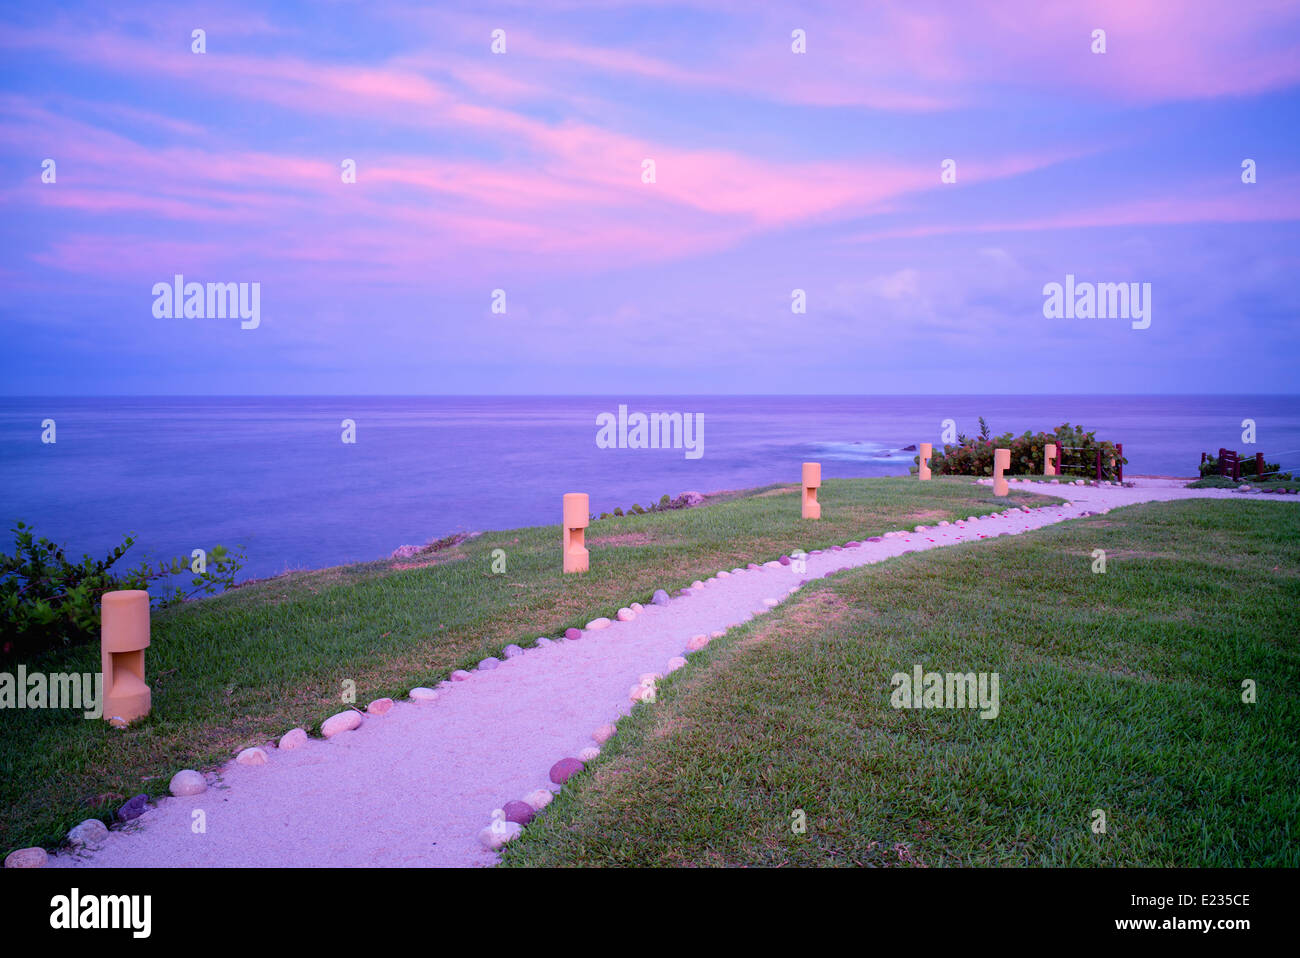 Path at Four Seasons Resort. Punta Mita, Mexico. - Stock Image